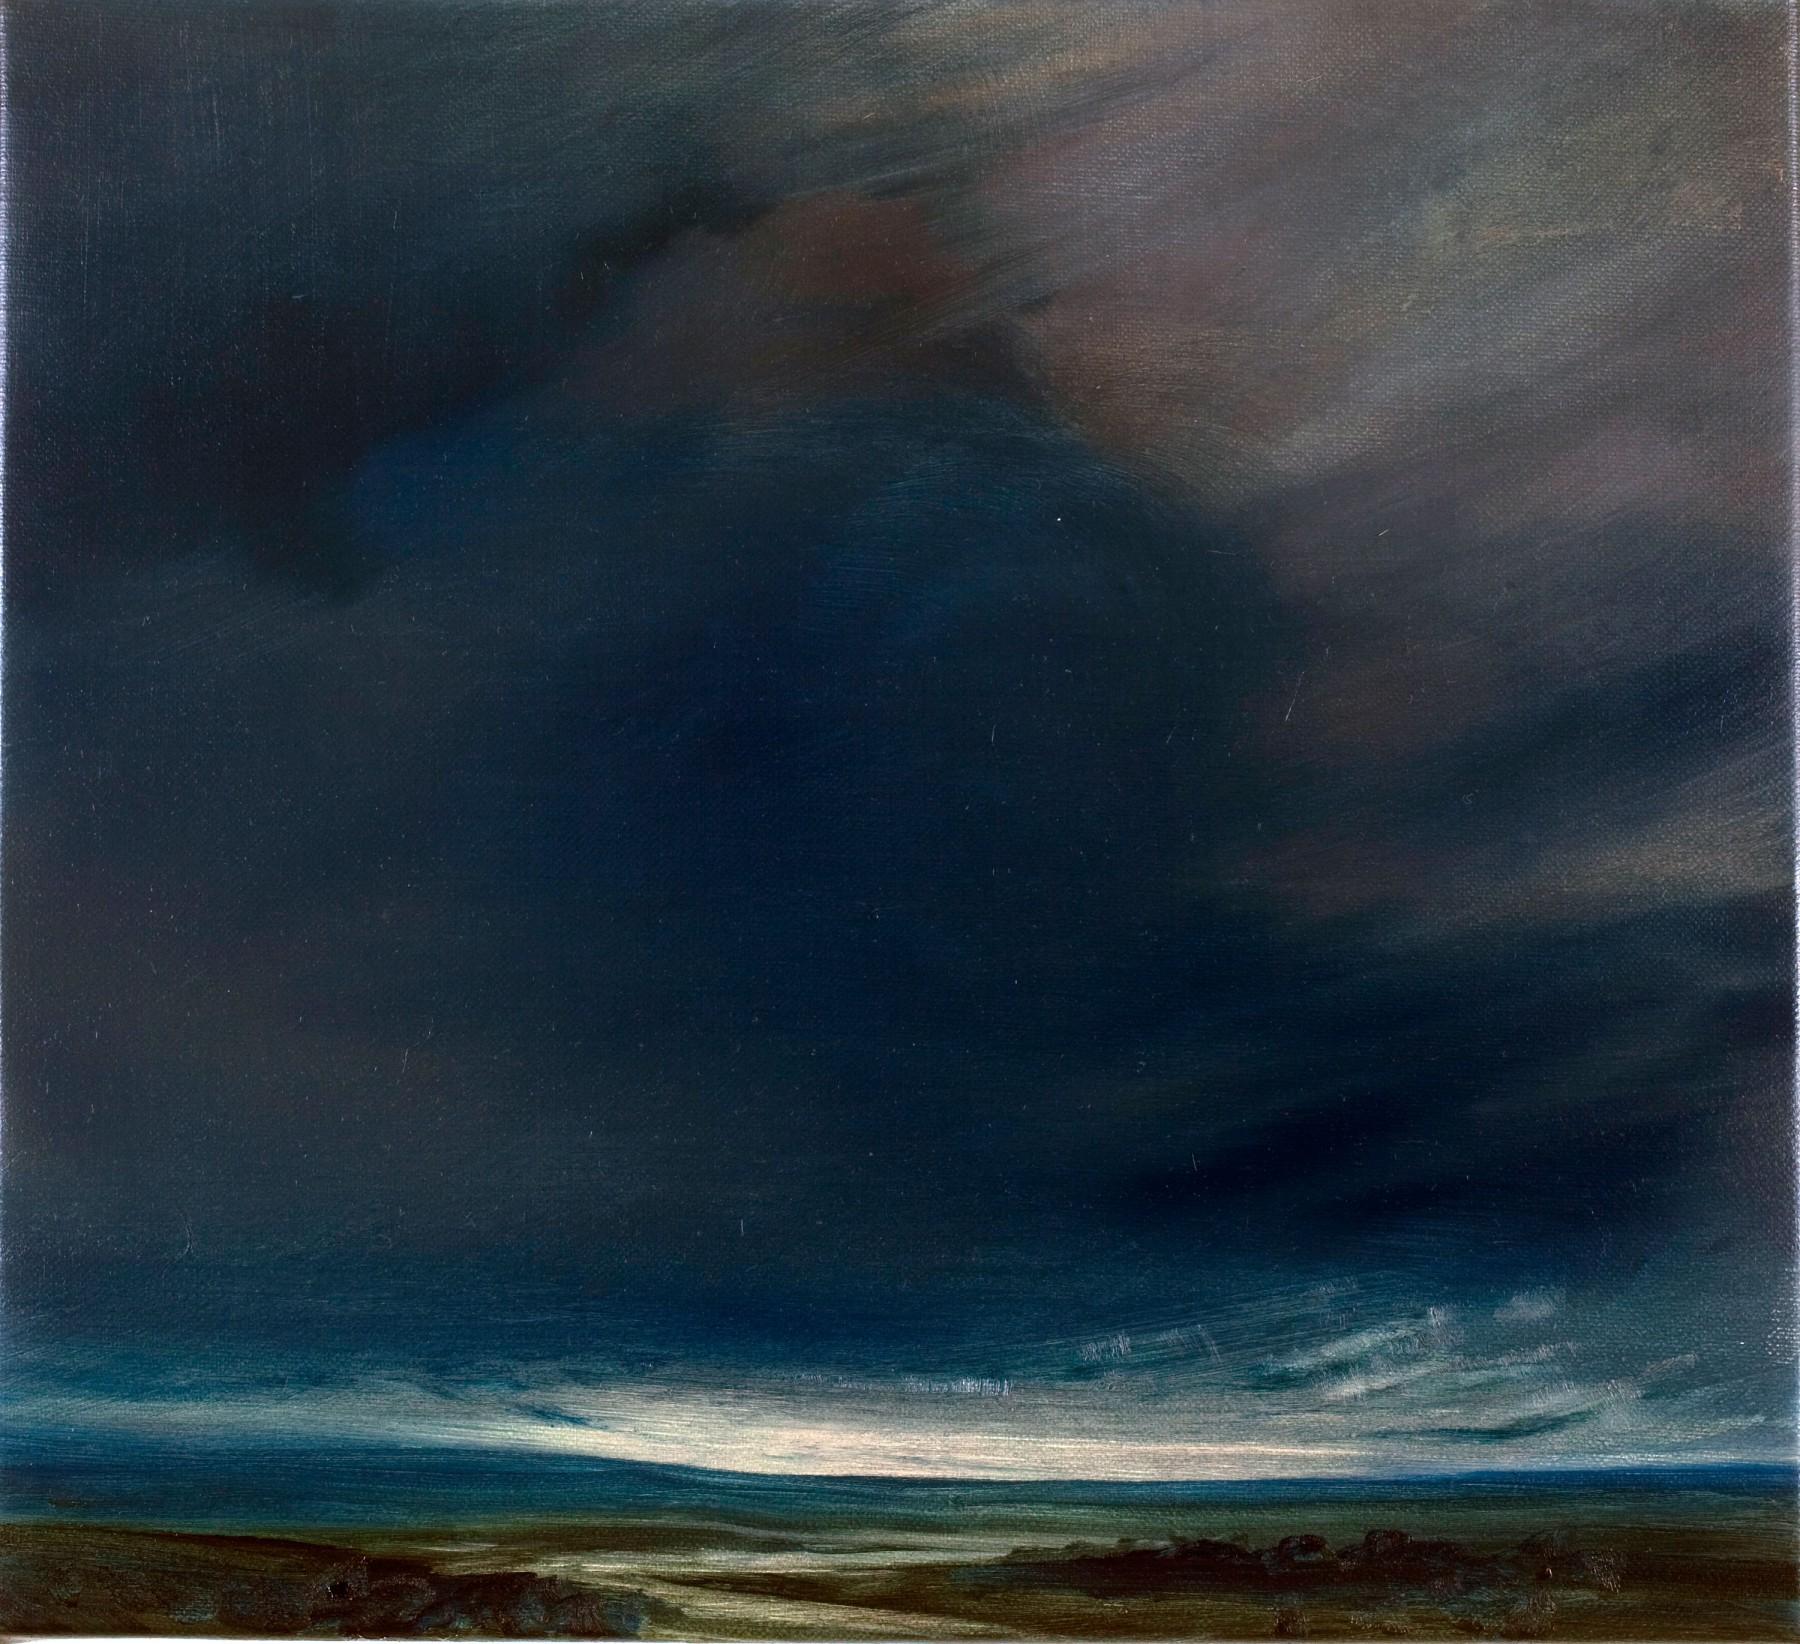 The Cloud Above II, 2009